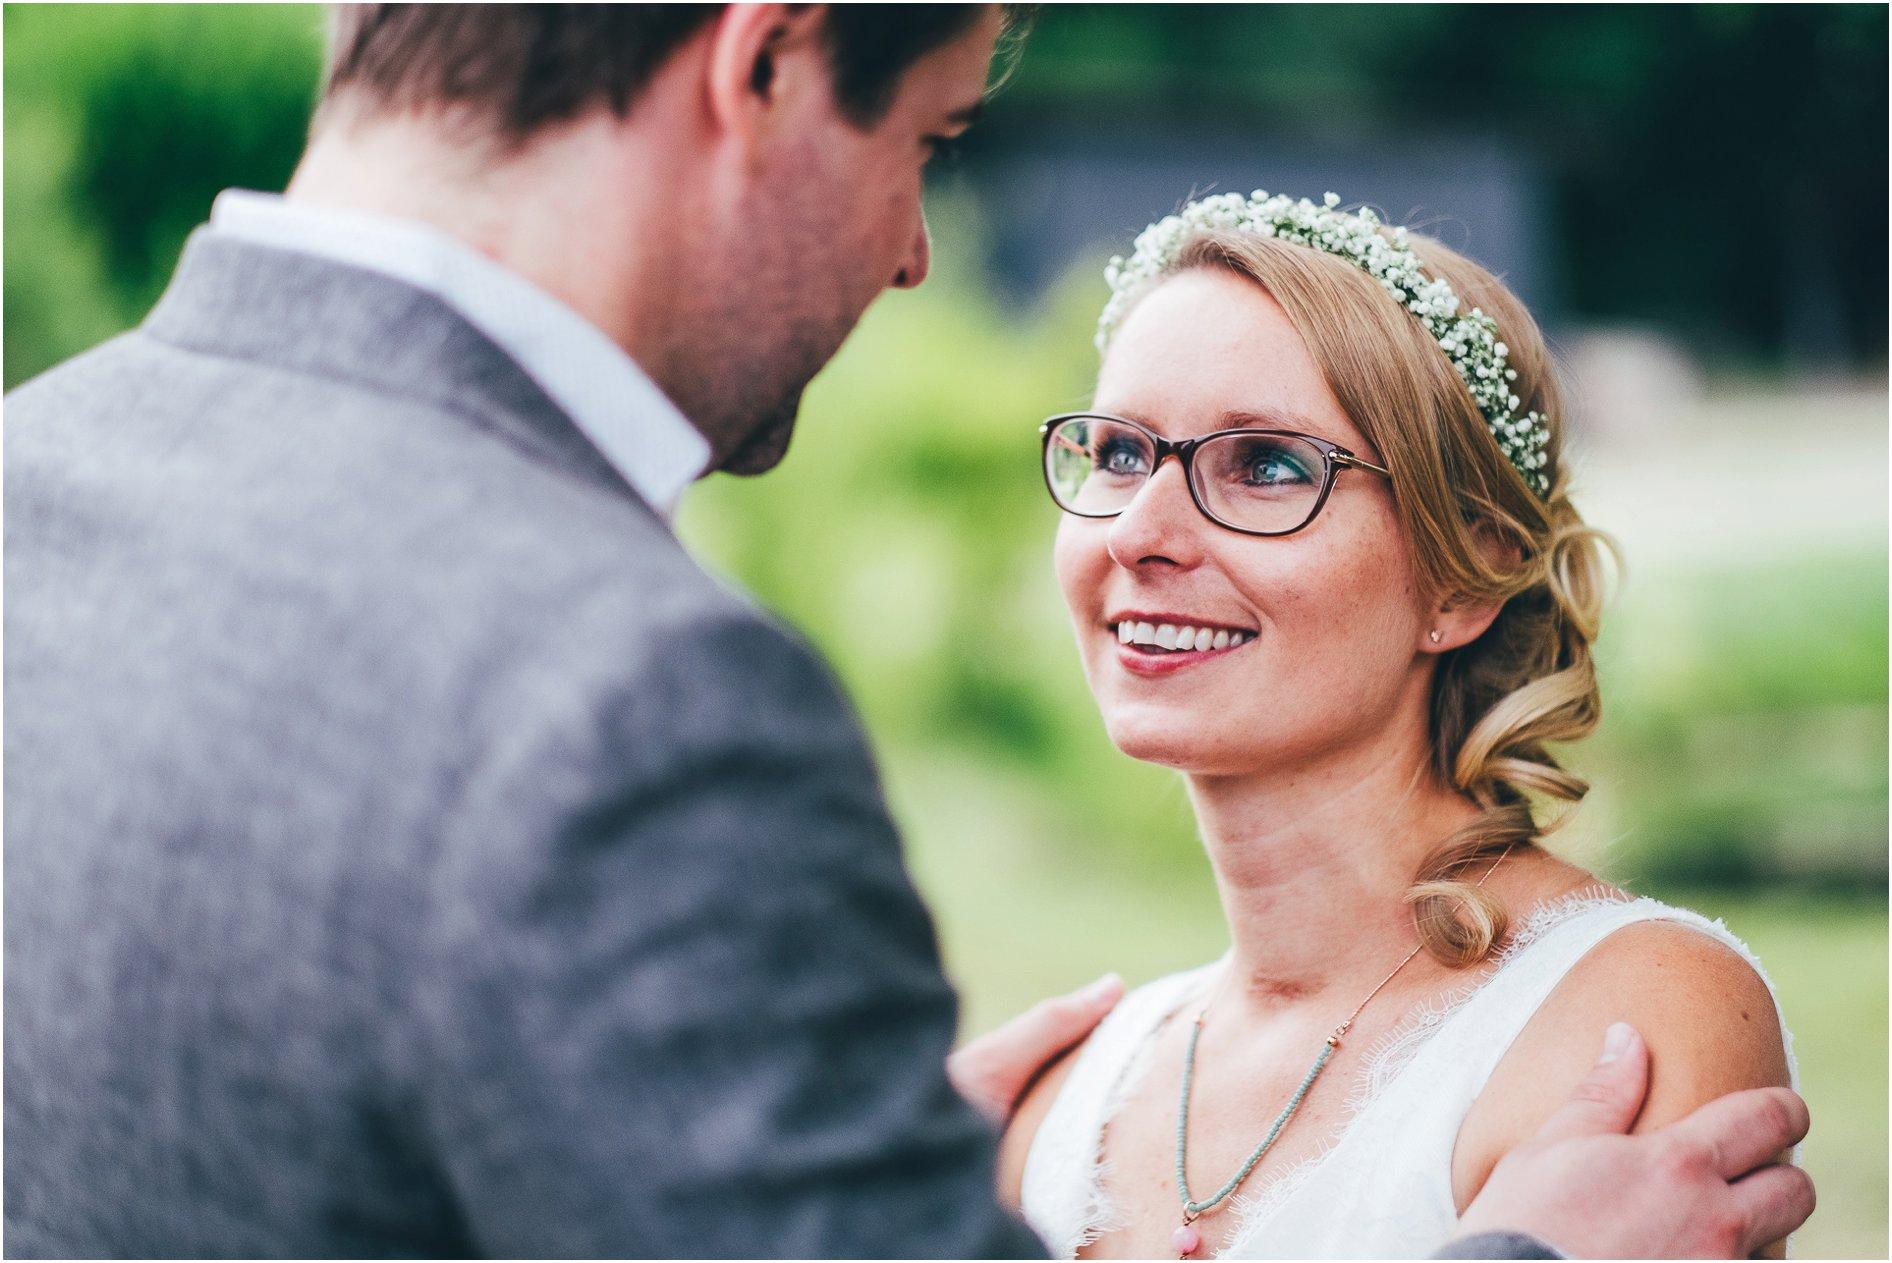 2016-04-19_0066 Sandra & Janis - Hochzeitsfotograf in Seevetal